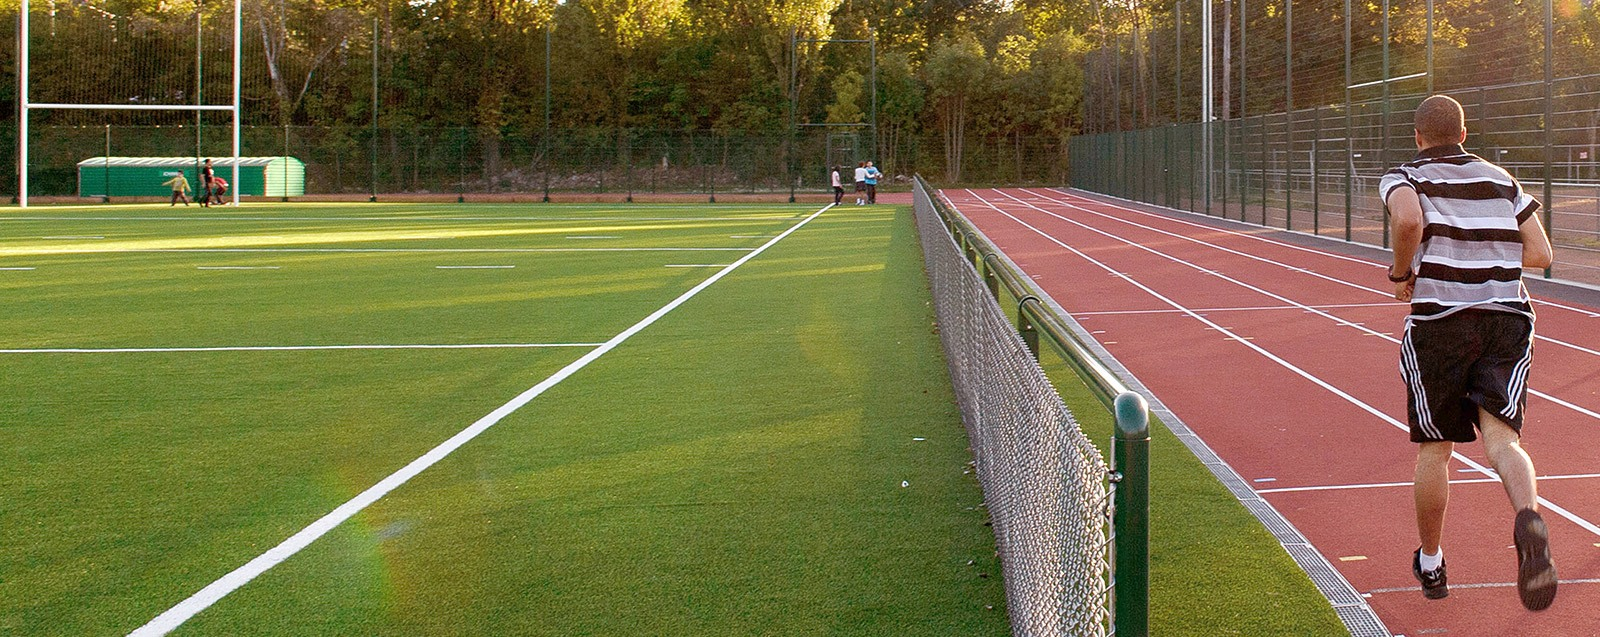 Stade des Roches équipements sportifs Villefontaine